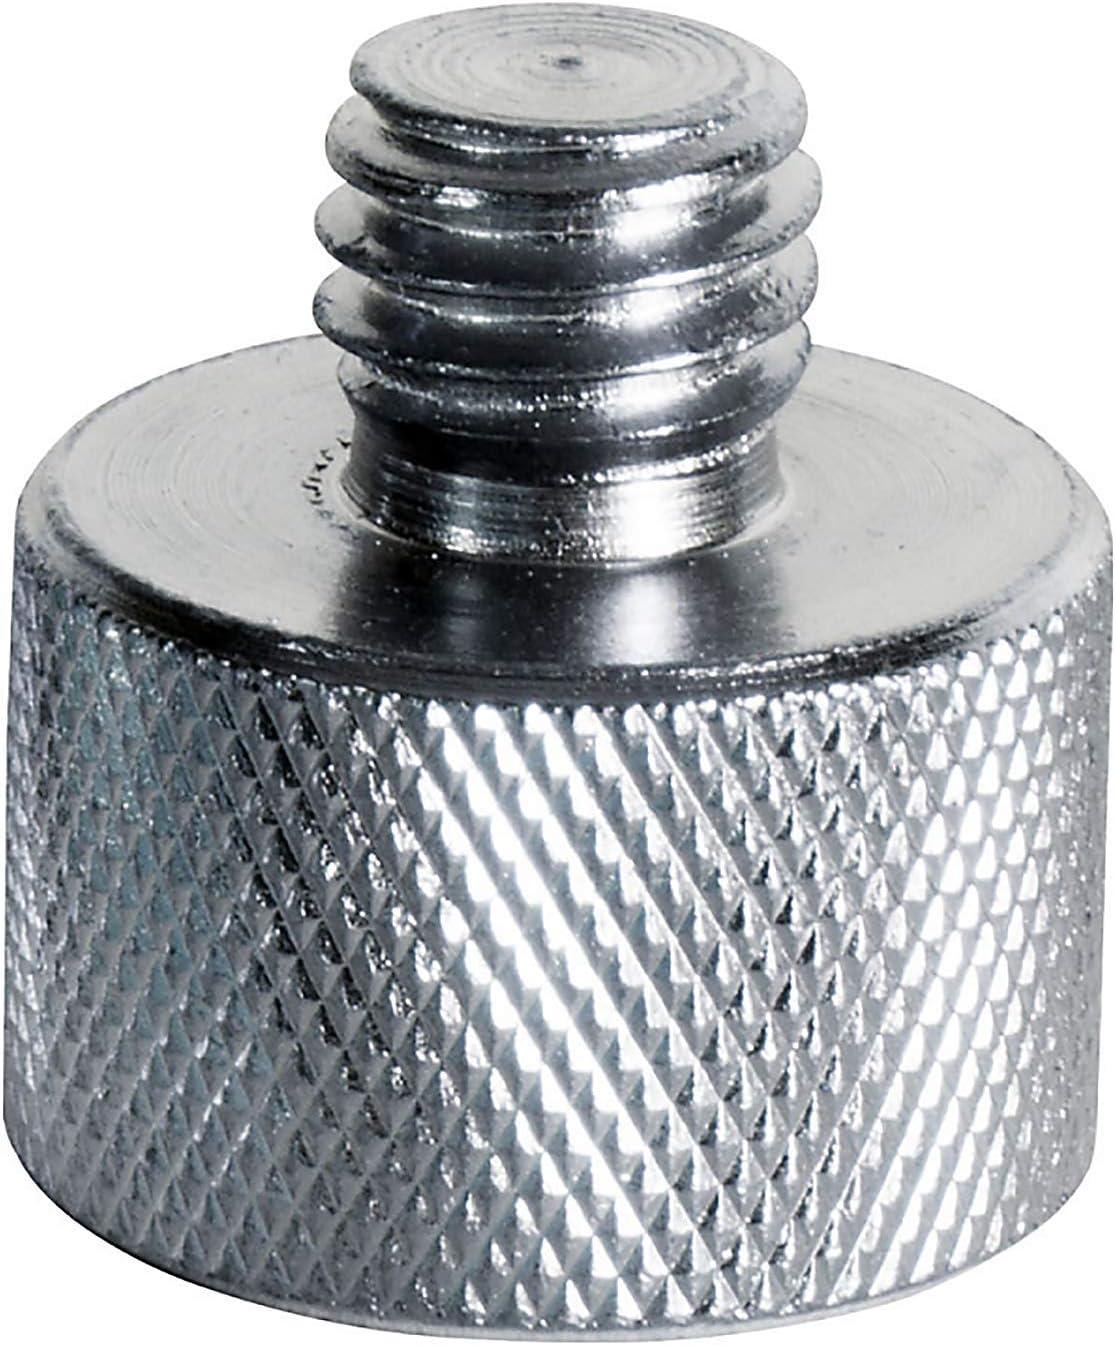 Premium/Mic Thread Screw Adapter 1//4 Male to 1//4 Male and 1//4 Male to 3//8 Male Microphone to Tripod Adapter Microphone Screw Converter Adapter,6 Pack